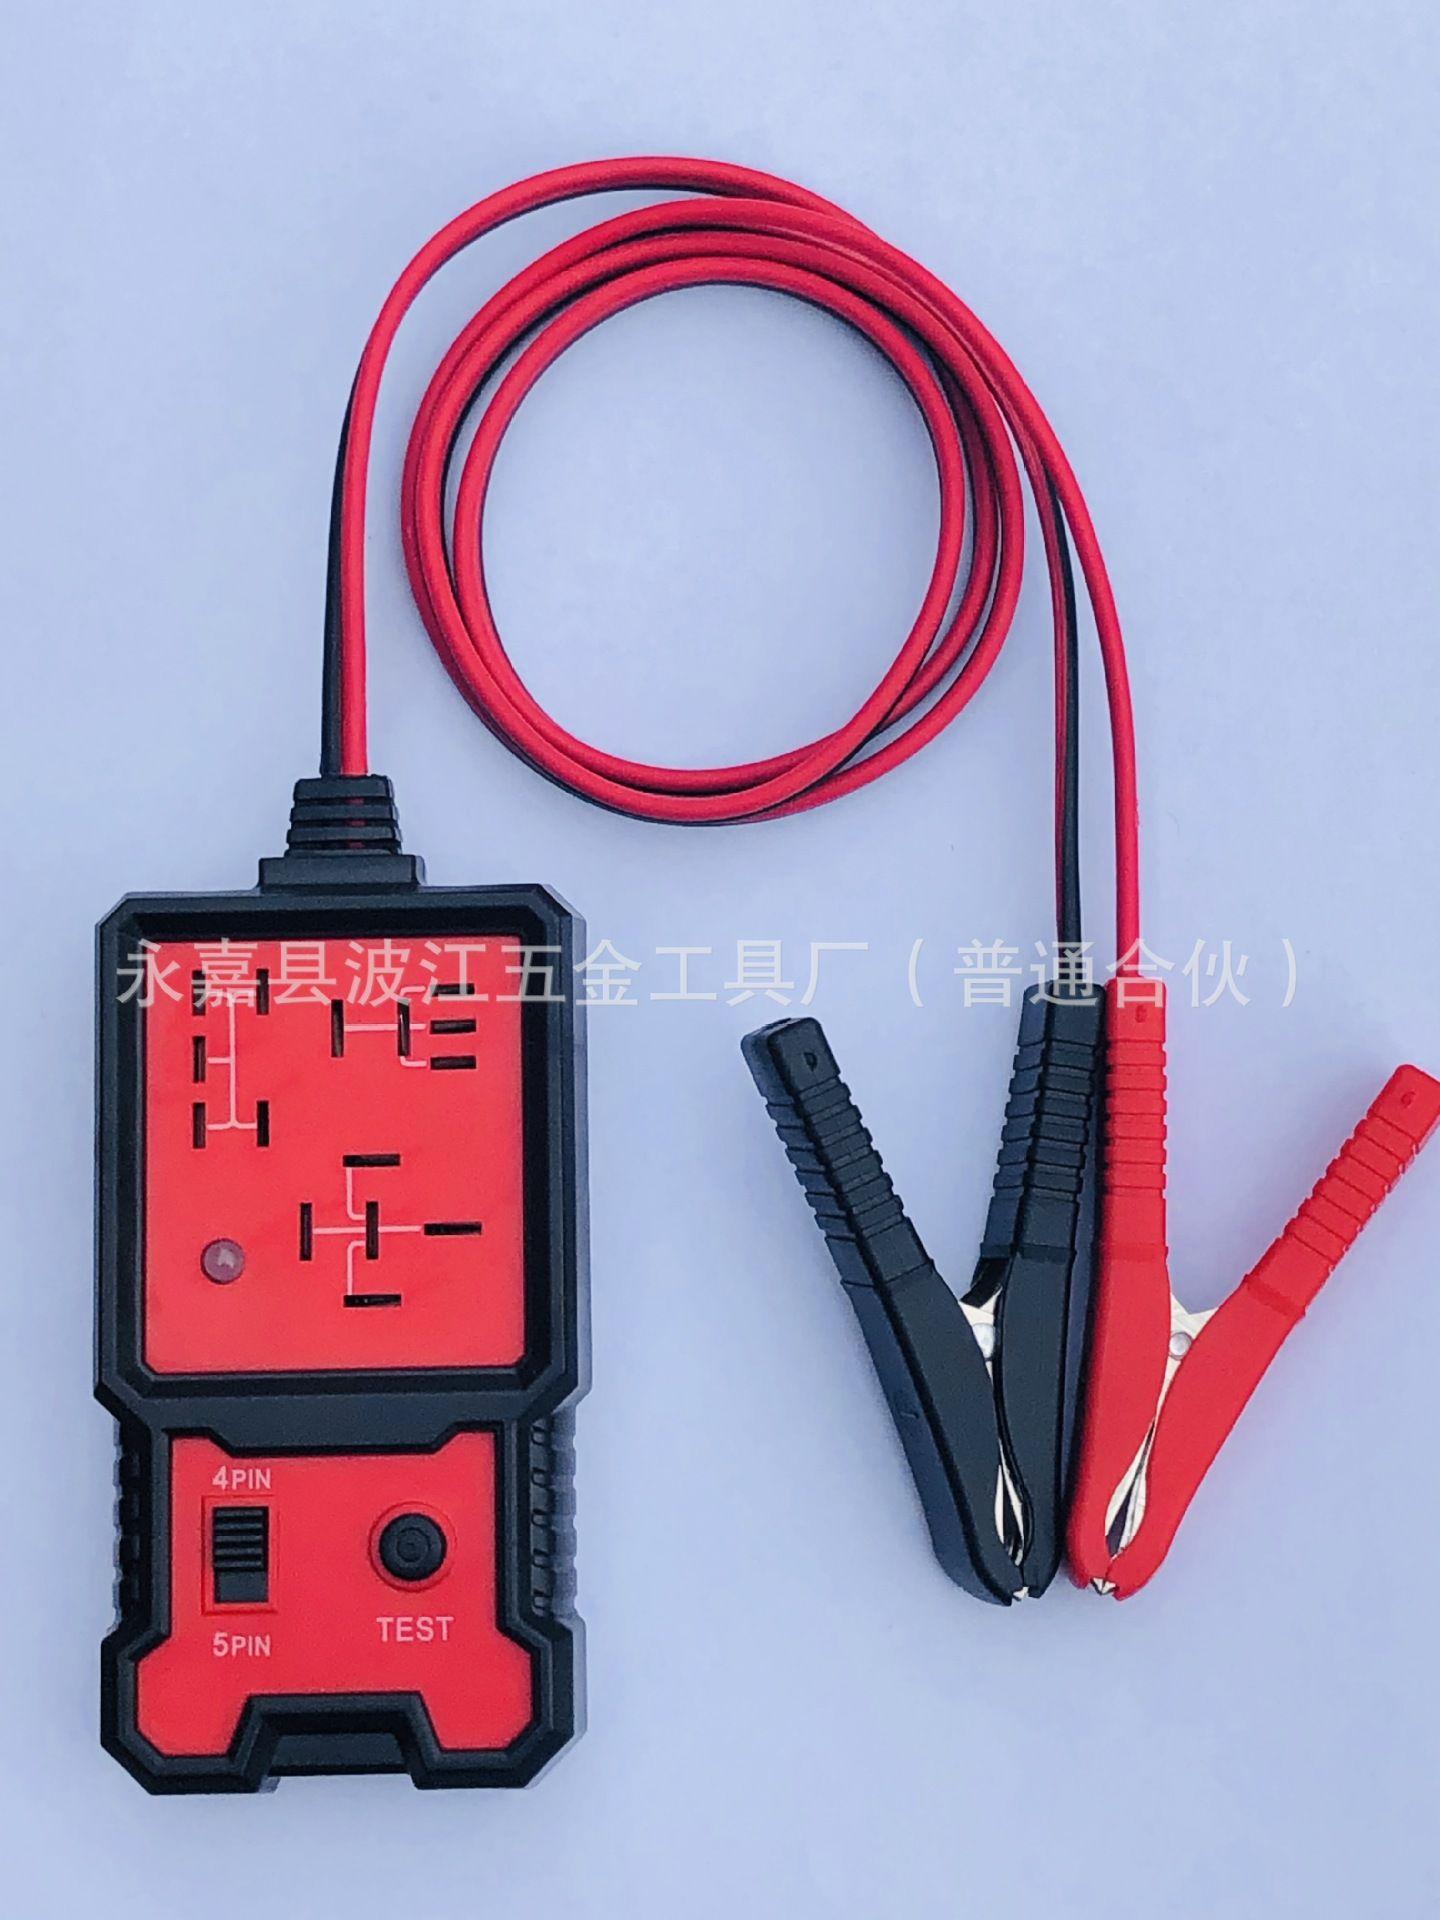 Automotive Relay Tester BJ-707 Tester Automotive Circuit-Tester Auto-Reparatur-Werkzeug